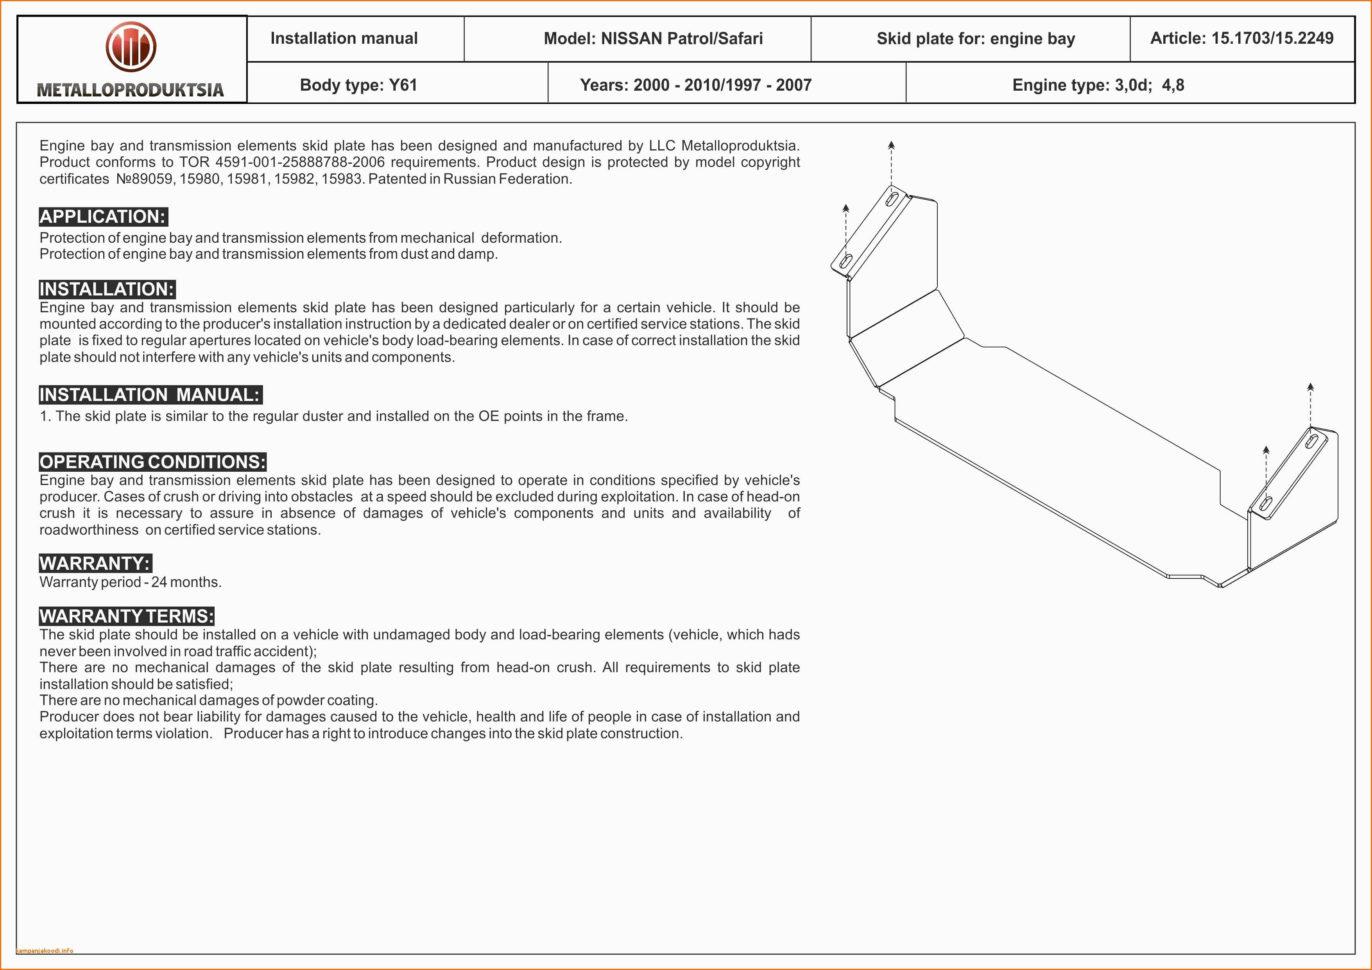 Pump Station Design Spreadsheet Intended For Spreadsheet Server Instructions 50 Fresh Pump Station Design